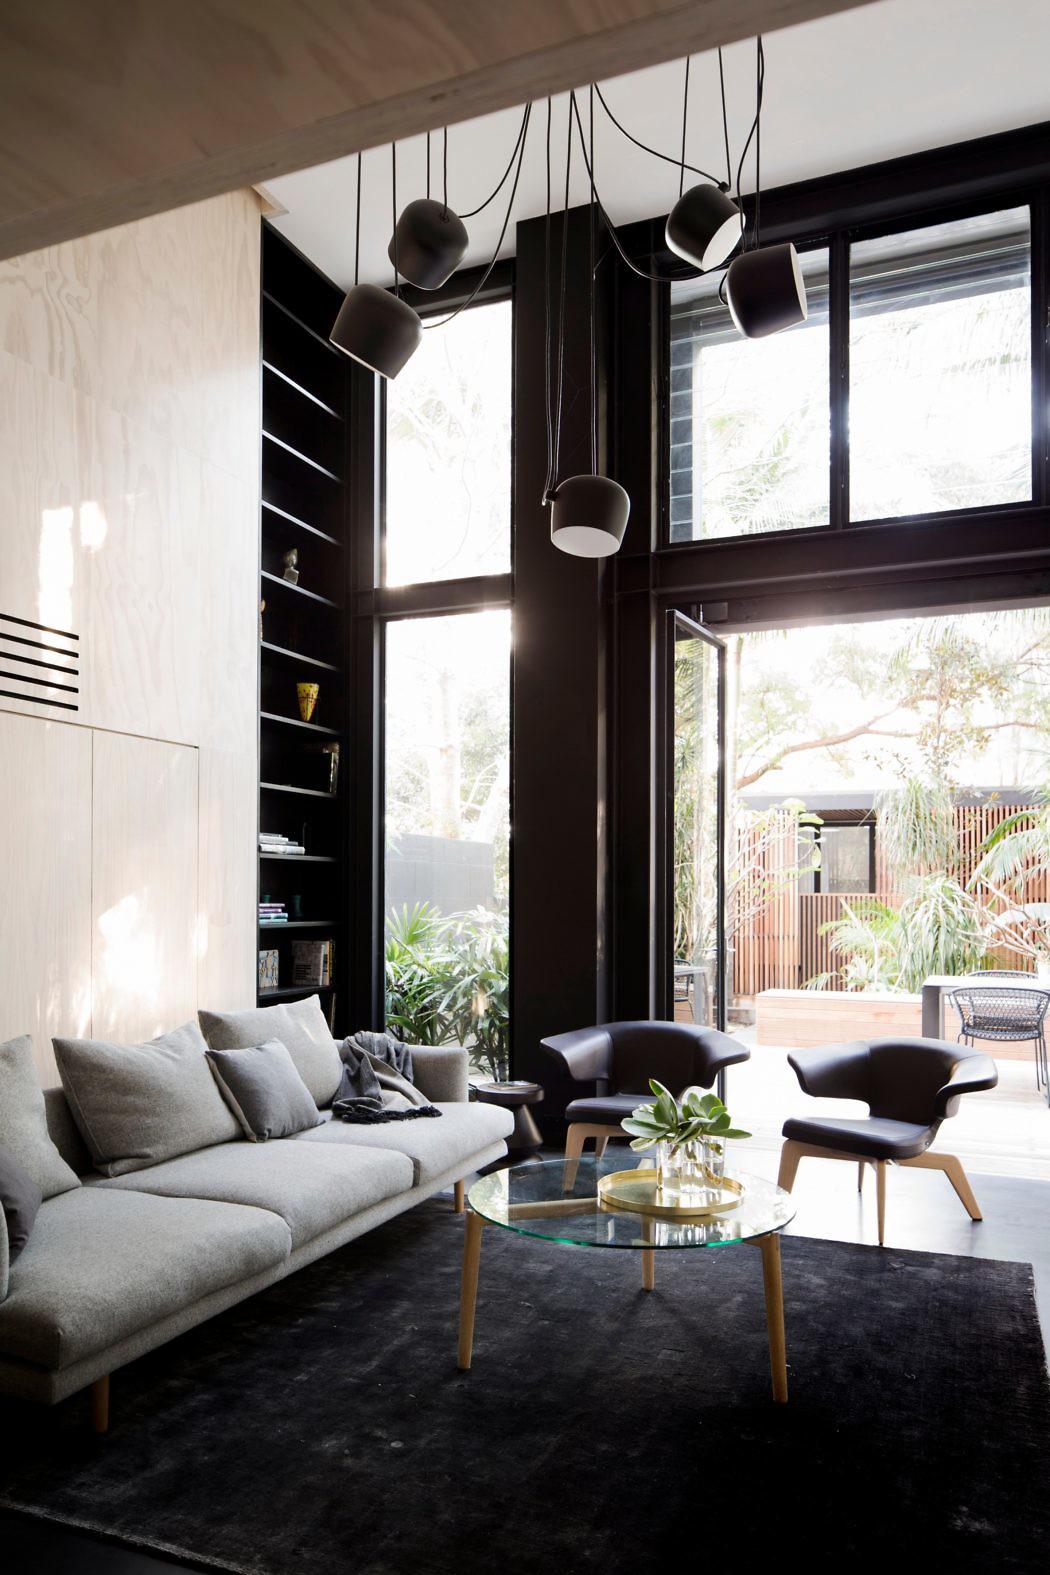 Elysium (2) - Archiscene - Your Daily Architecture & Design